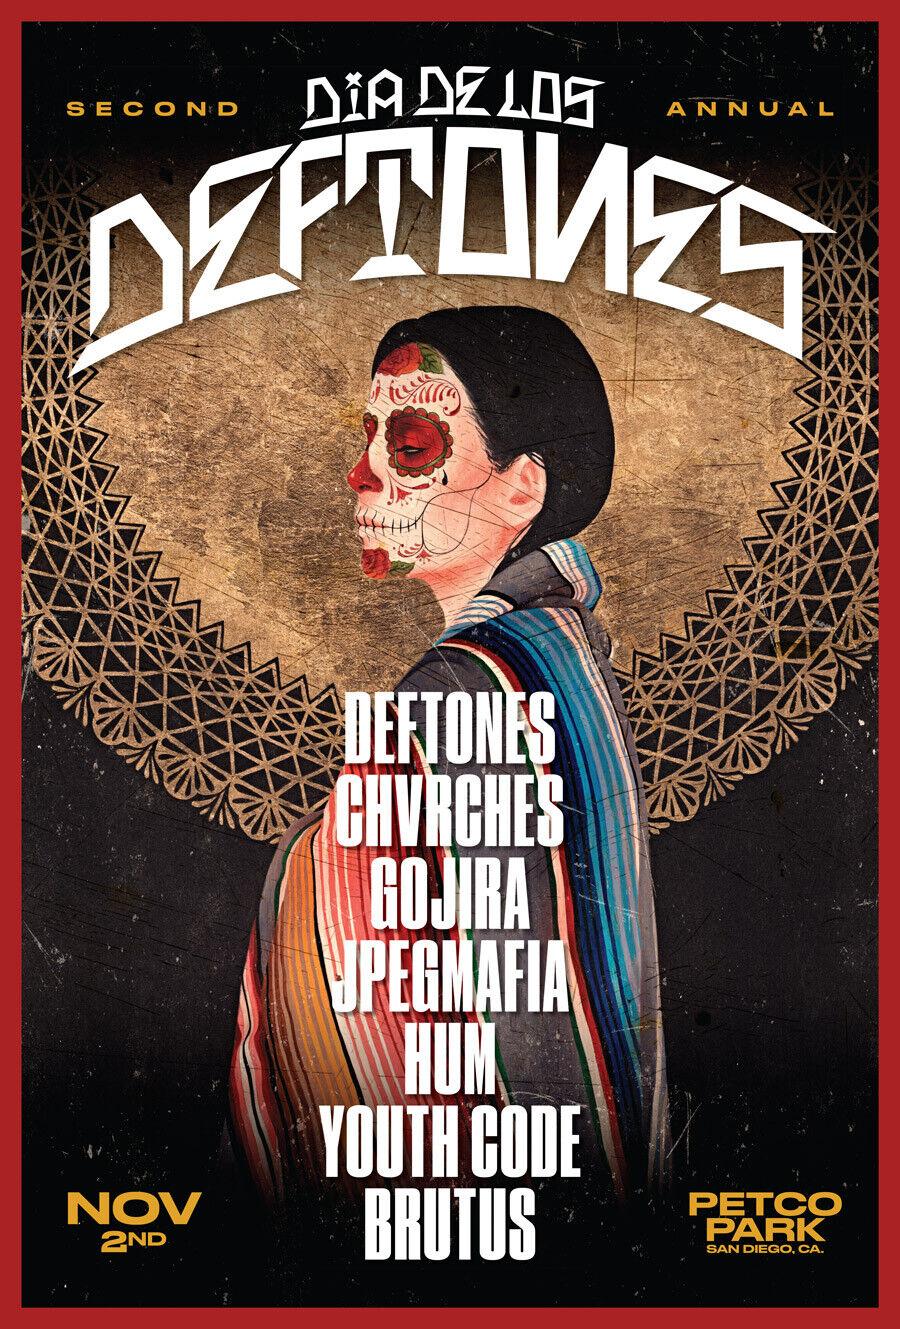 DEFTONES/CHVRCHES/GOJIA/HUM DIA DE LOS DEFTONES 2019 SAN DIEGO CONCERT POSTER - $11.99